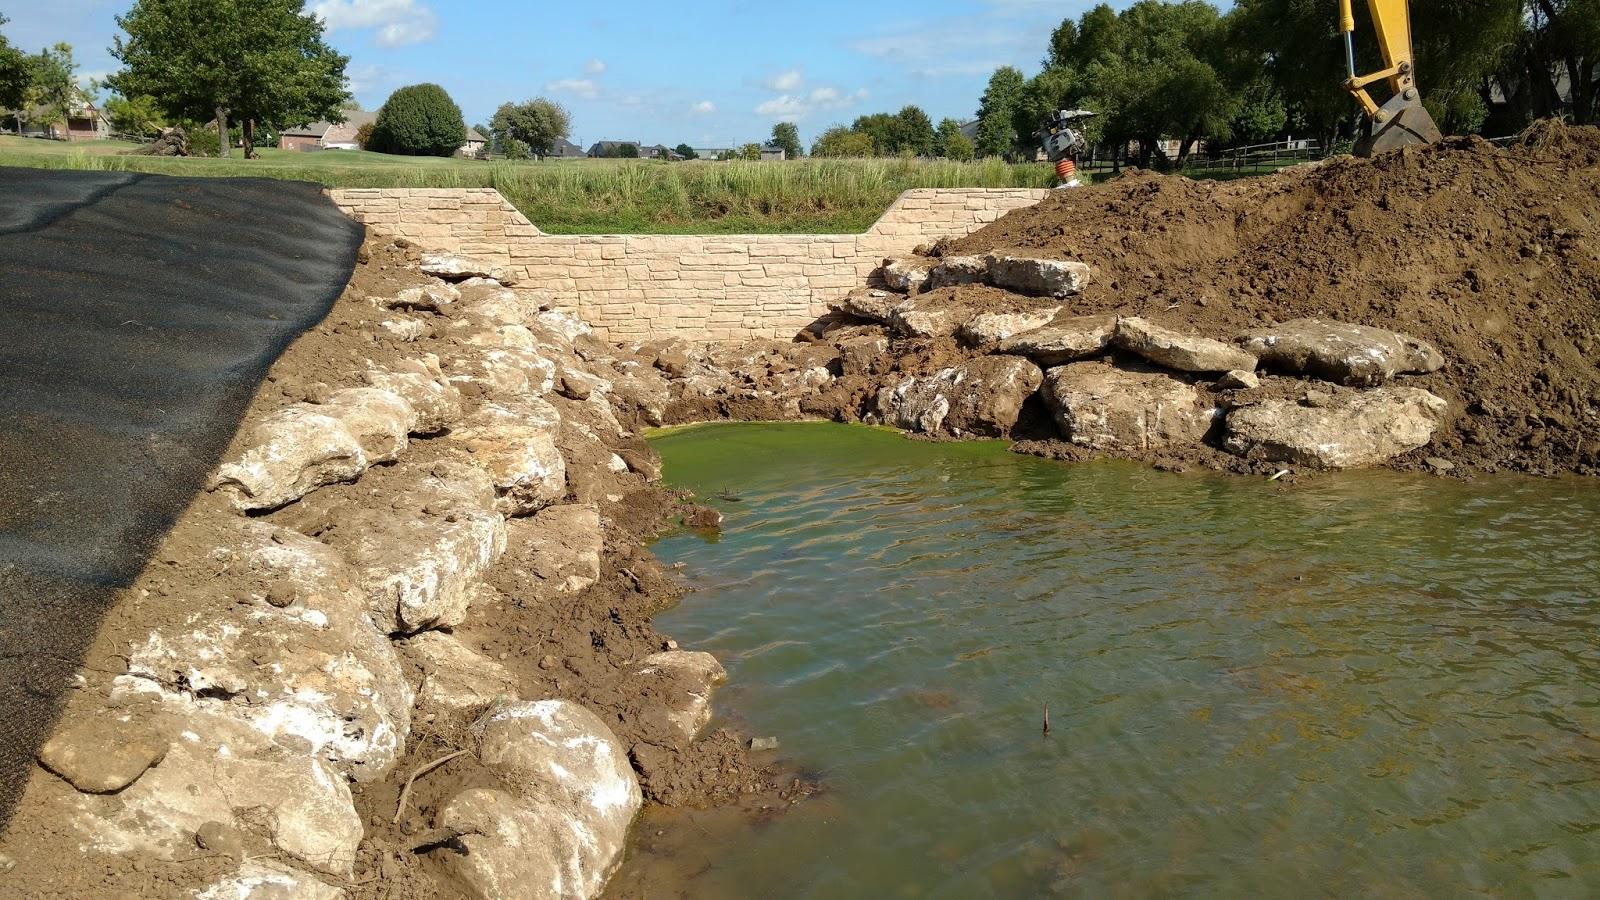 Grounds department blog 3 pond dam construction complete for Small pond dam design